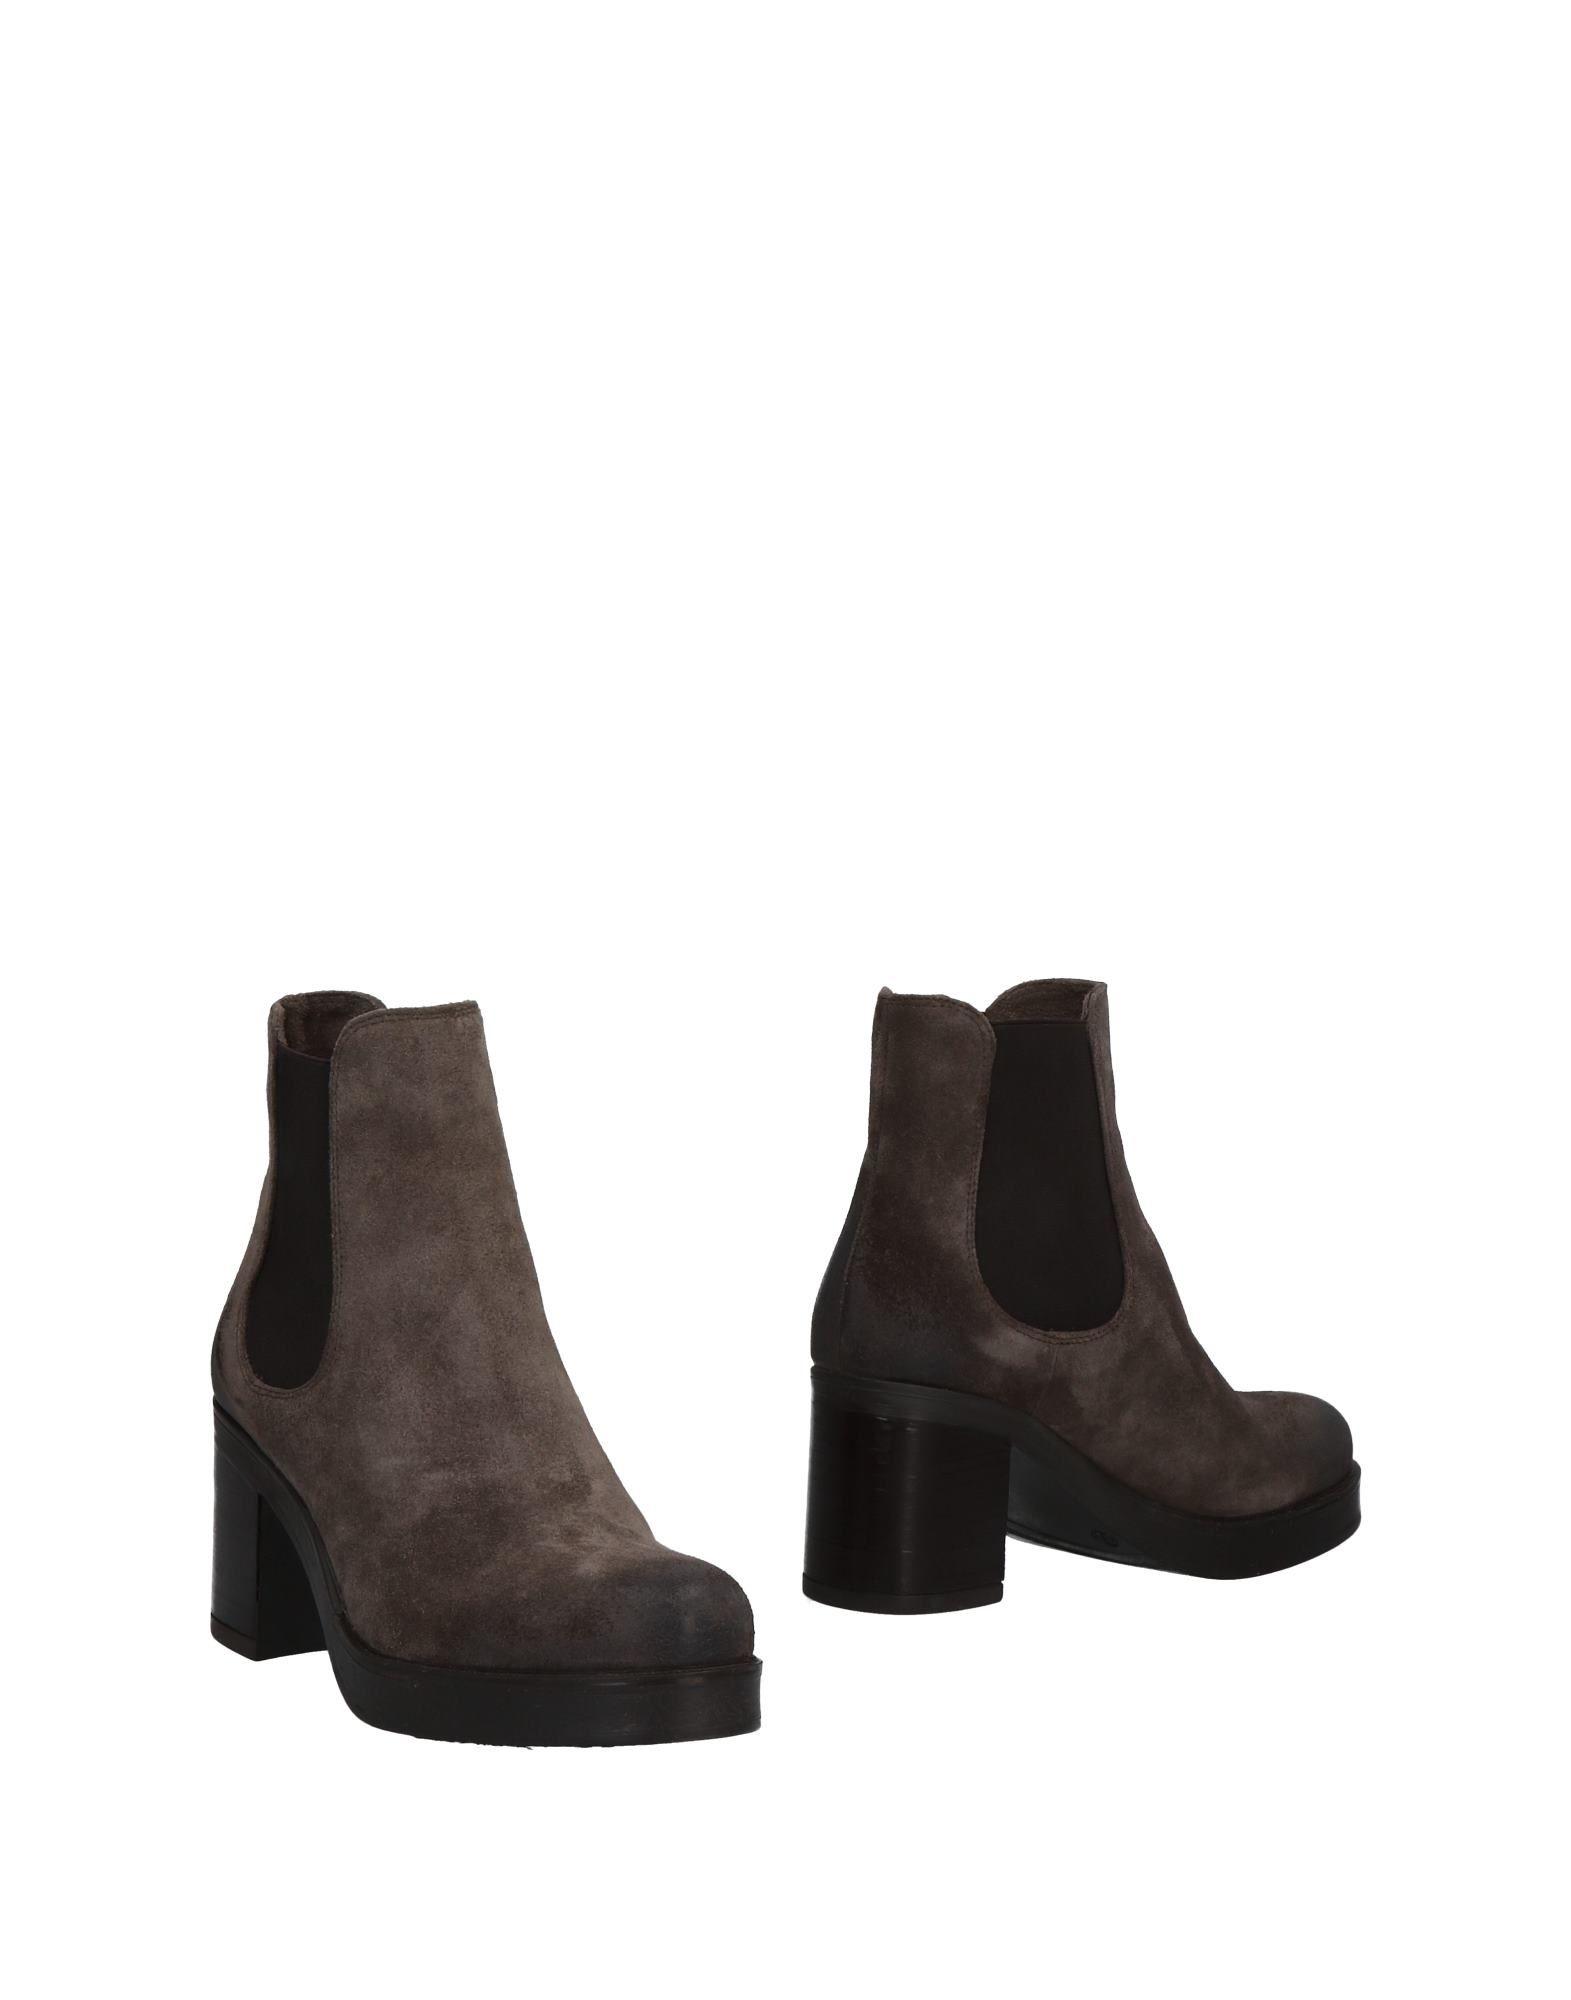 Cuoieria Chelsea Boots Qualität Damen  11483201HD Gute Qualität Boots beliebte Schuhe 6bc238